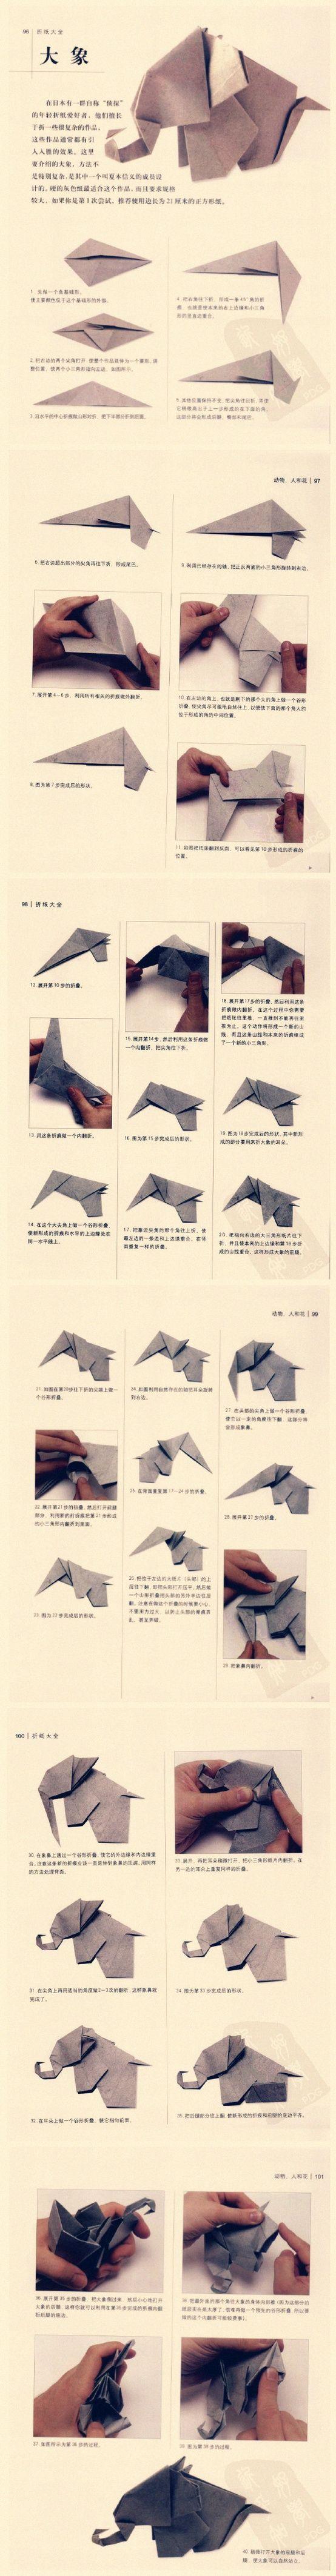 origami elephant directions